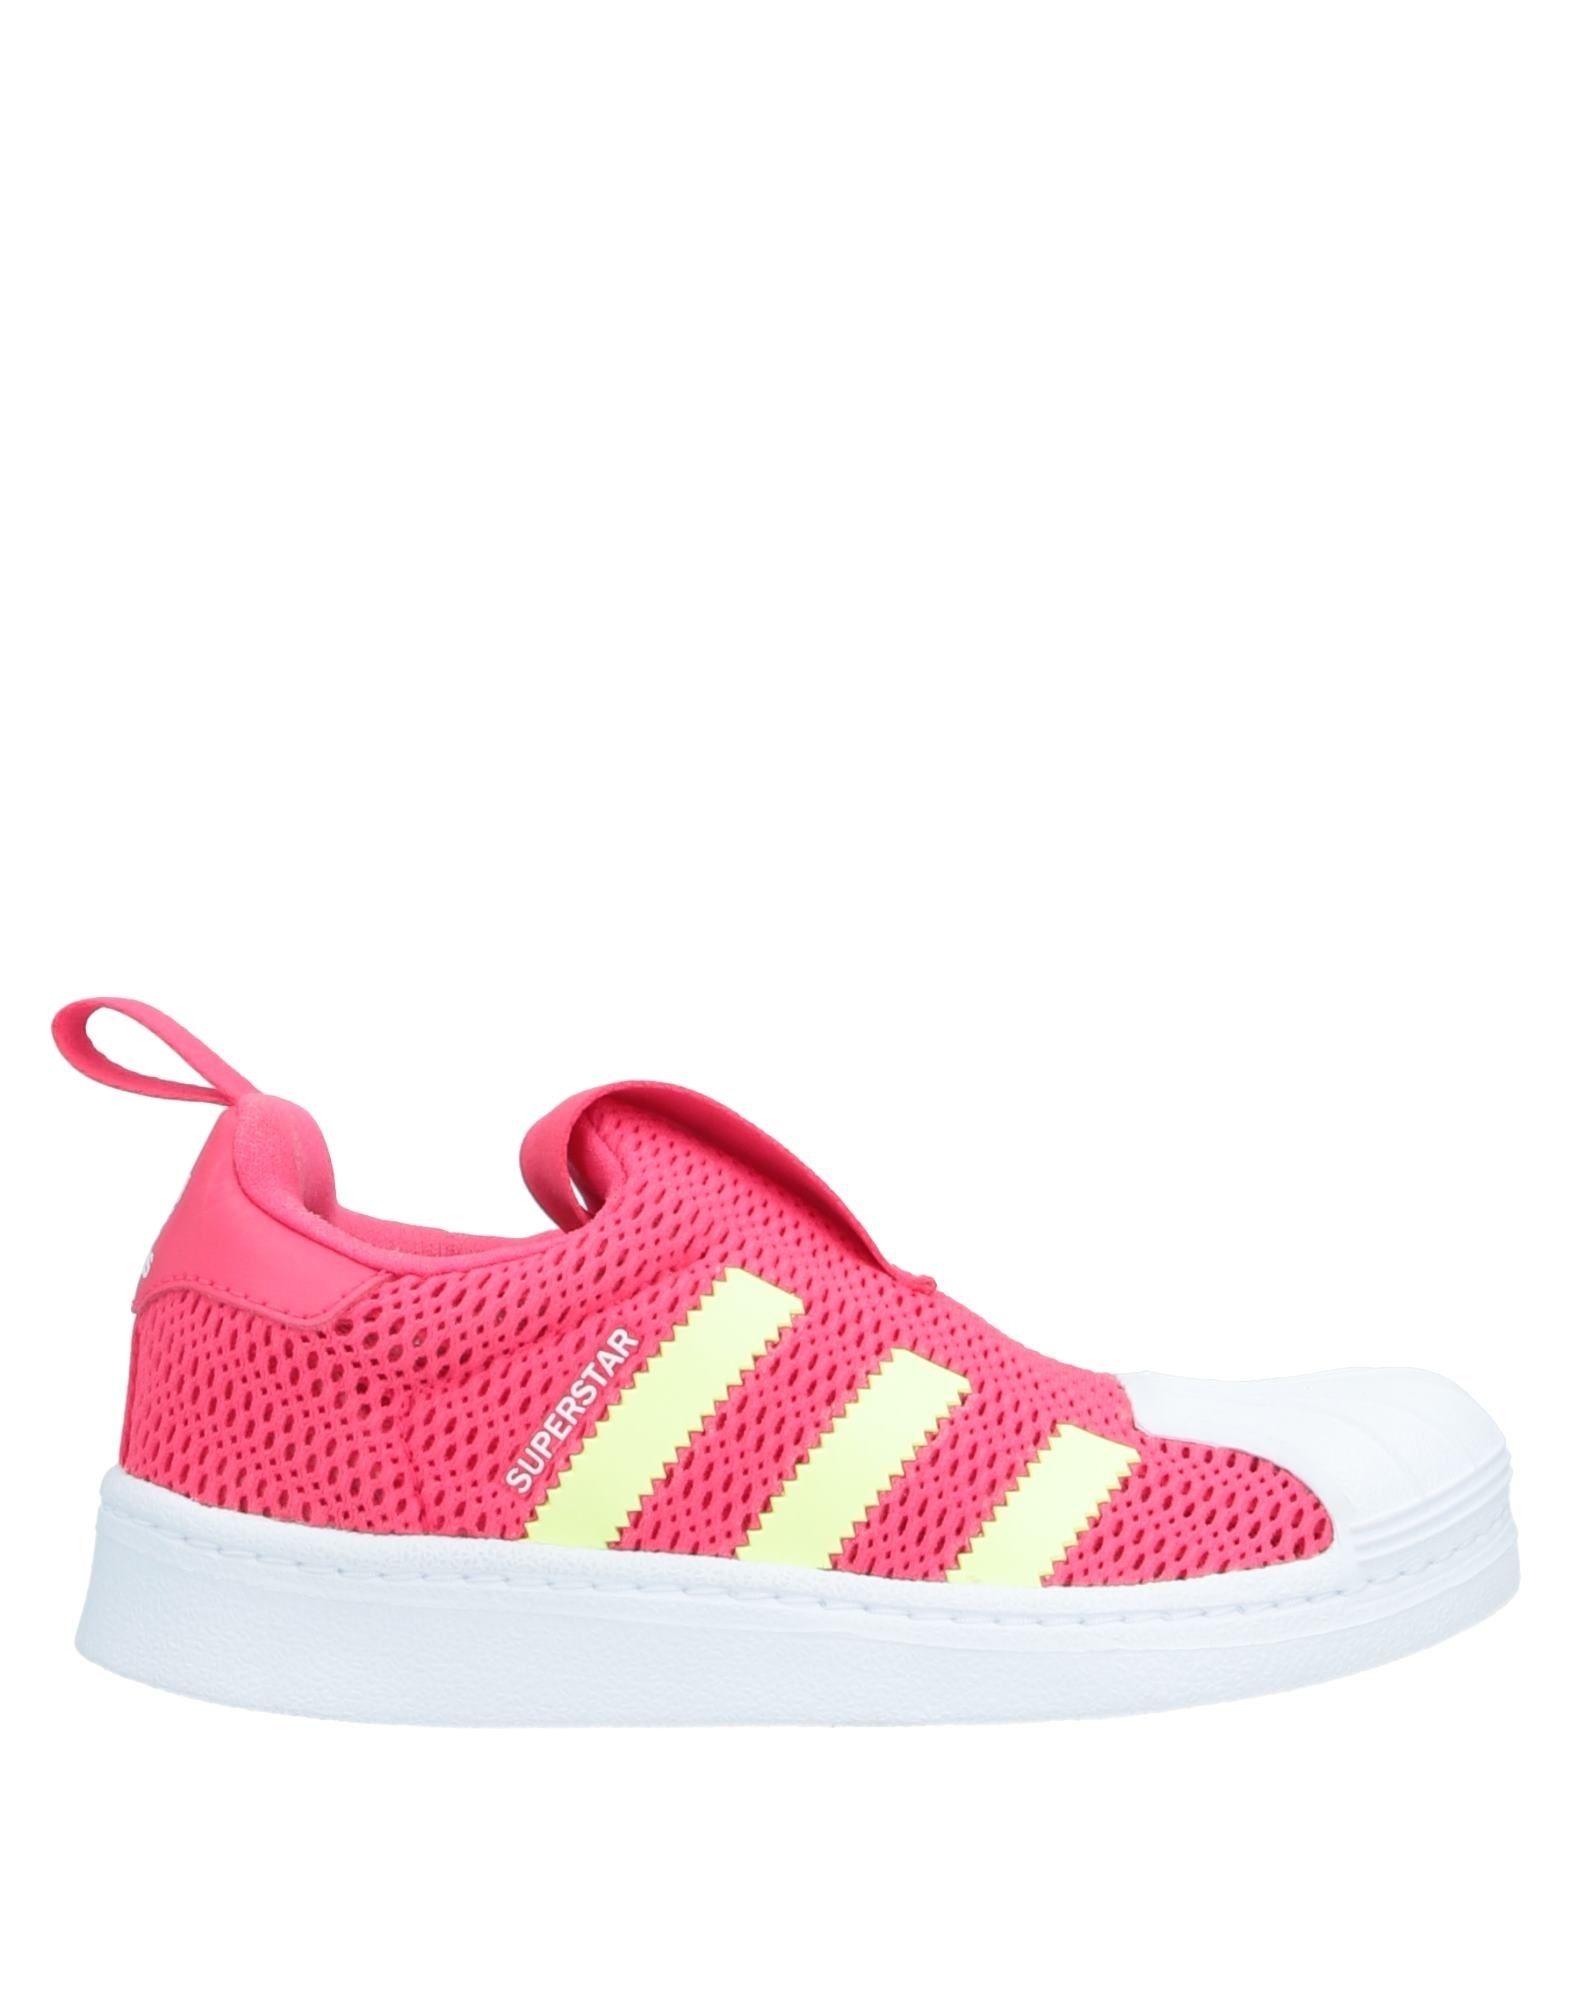 ADIDAS ORIGINALS Низкие кеды и кроссовки кеды adidas originals adidas originals ad093awhlch7